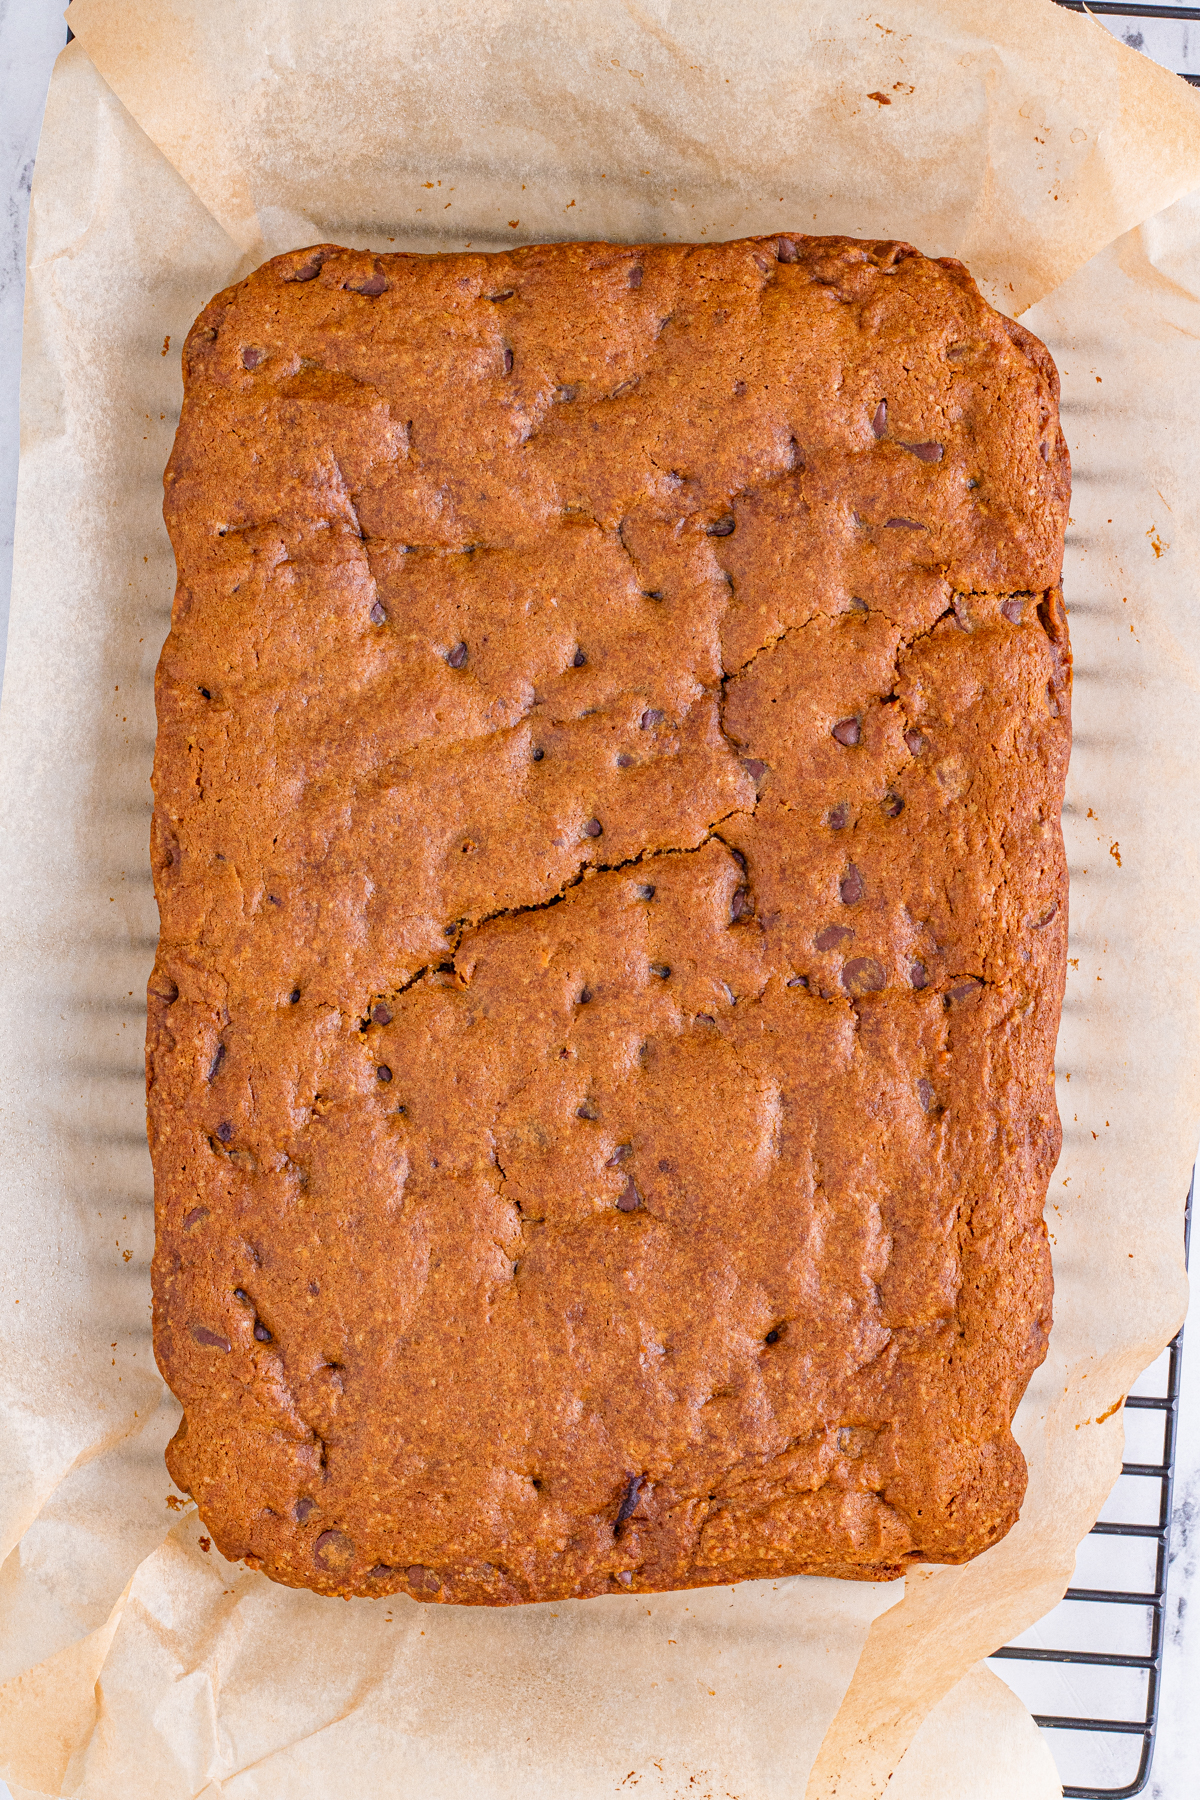 baked pumpkin blondies on a piece of parchment paper